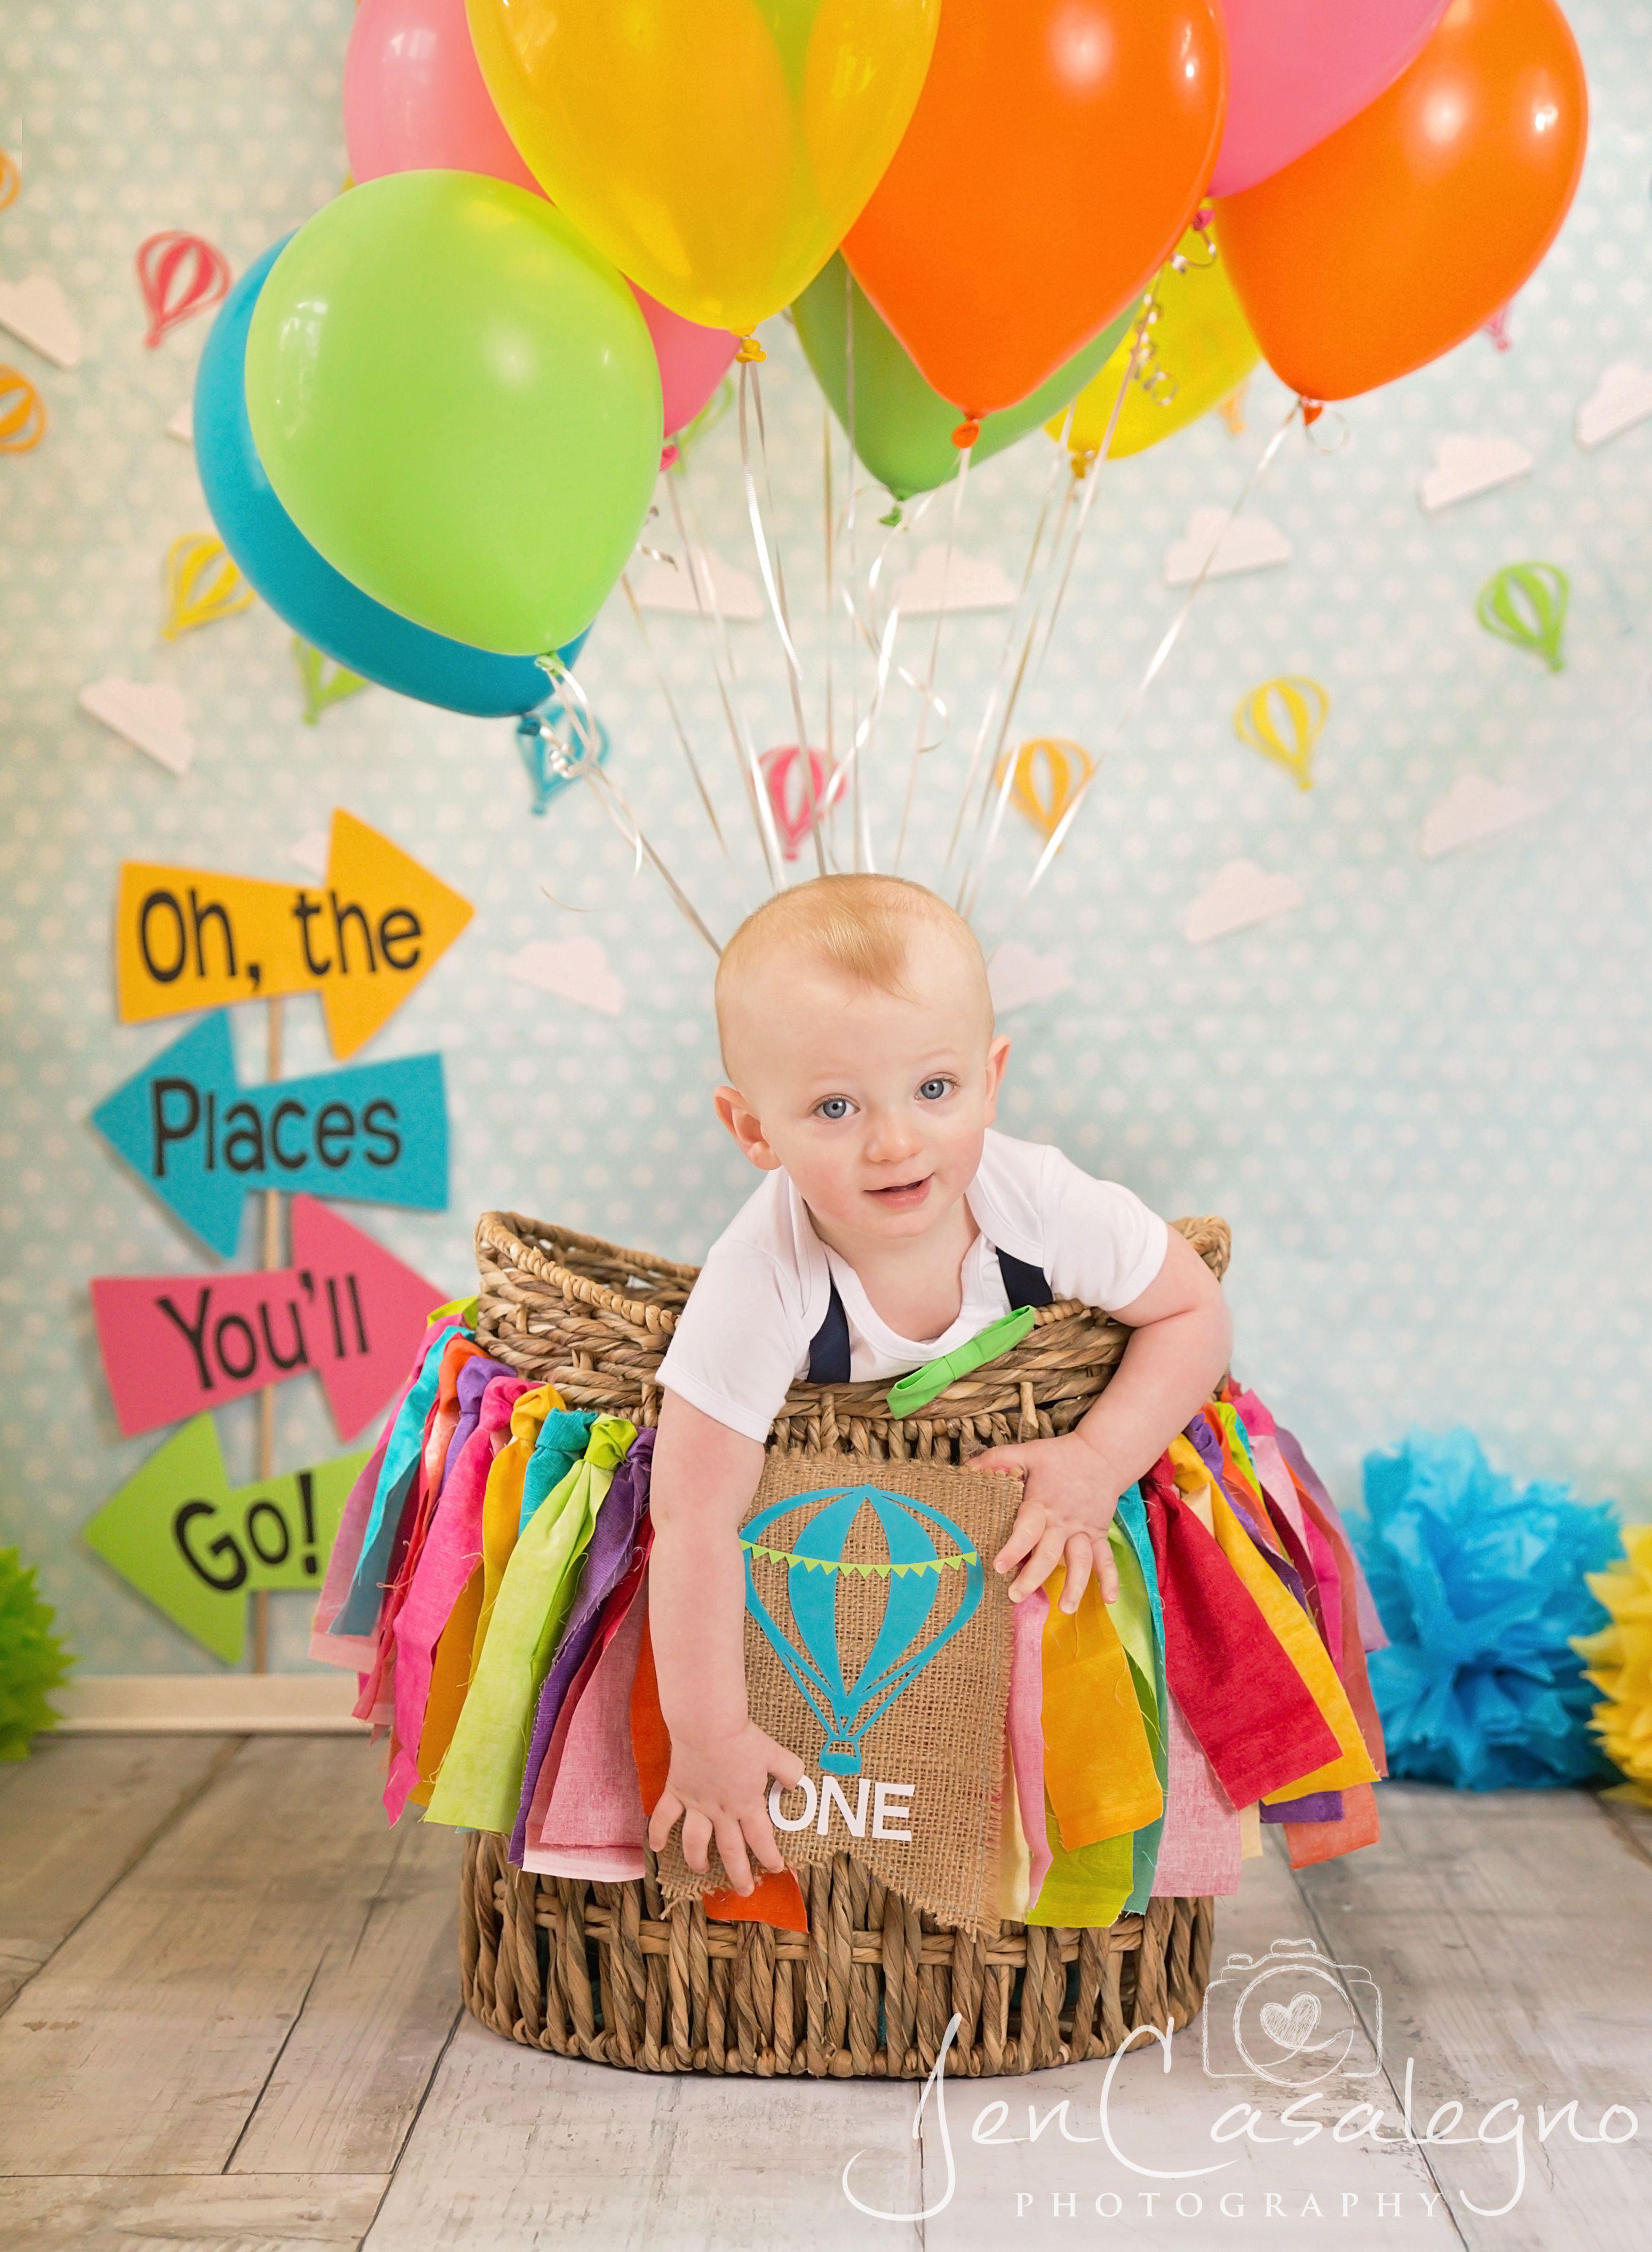 Dr Seuss Oh The Places You Ll Go Theme Birthday Hot Air Balloon Photograph Photo Sh Boys First Birthday Party Ideas First Birthday Pictures 1st Boy Birthday